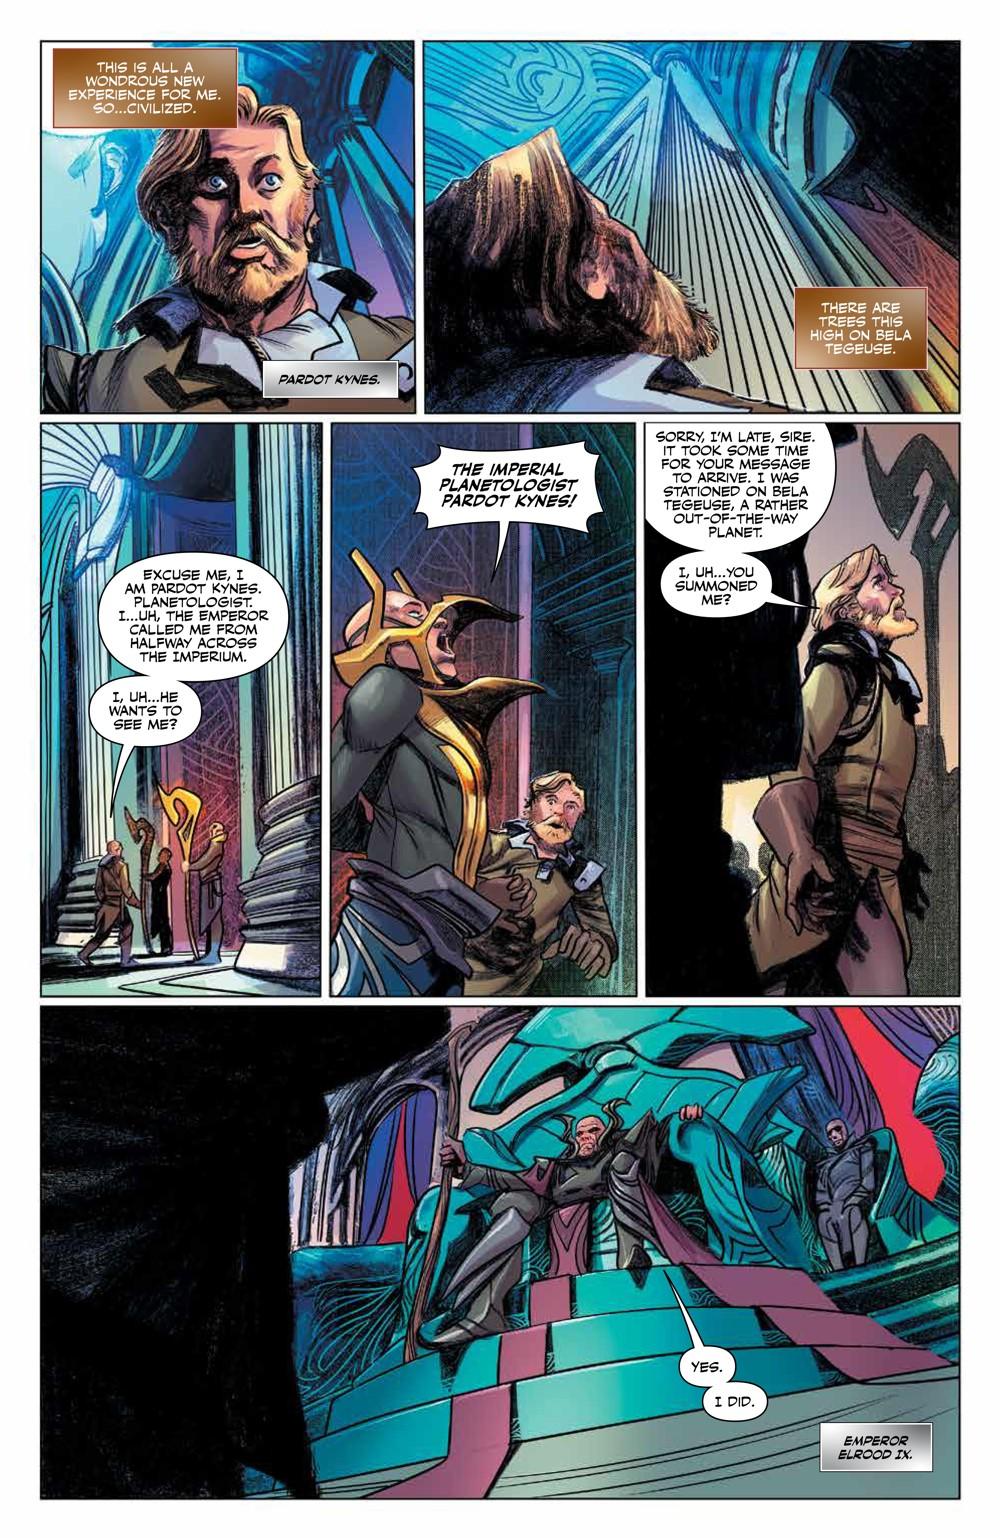 Dune_HouseAtreides_v1_HC_PRESS_14 ComicList Previews: DUNE HOUSE ATREIDES VOLUME 1 HC